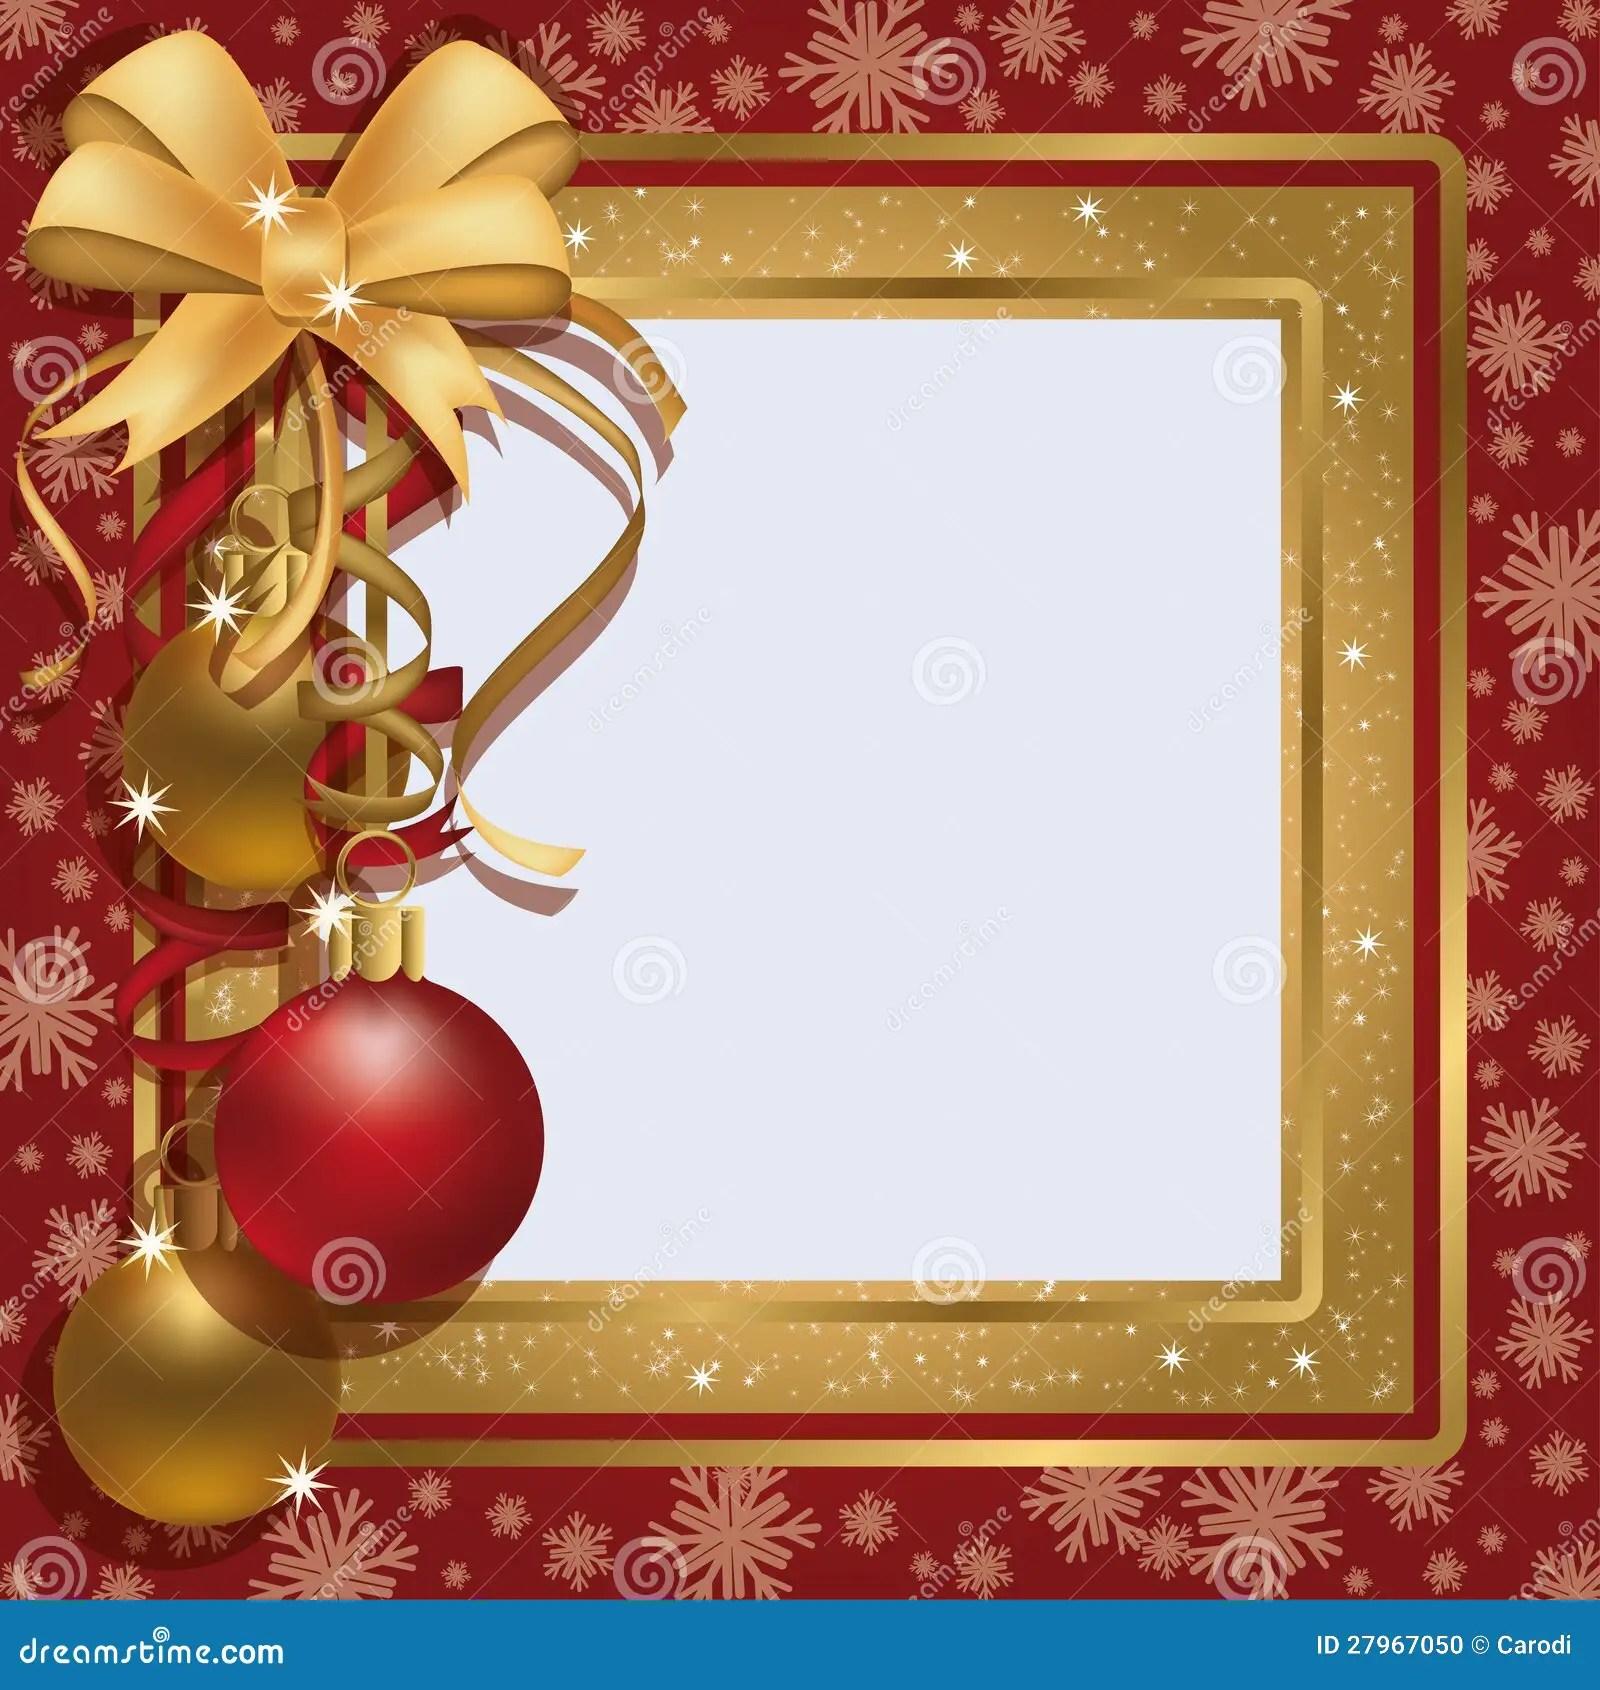 Christmas Greeting Photo Frame Scrapbooking Stock Photo